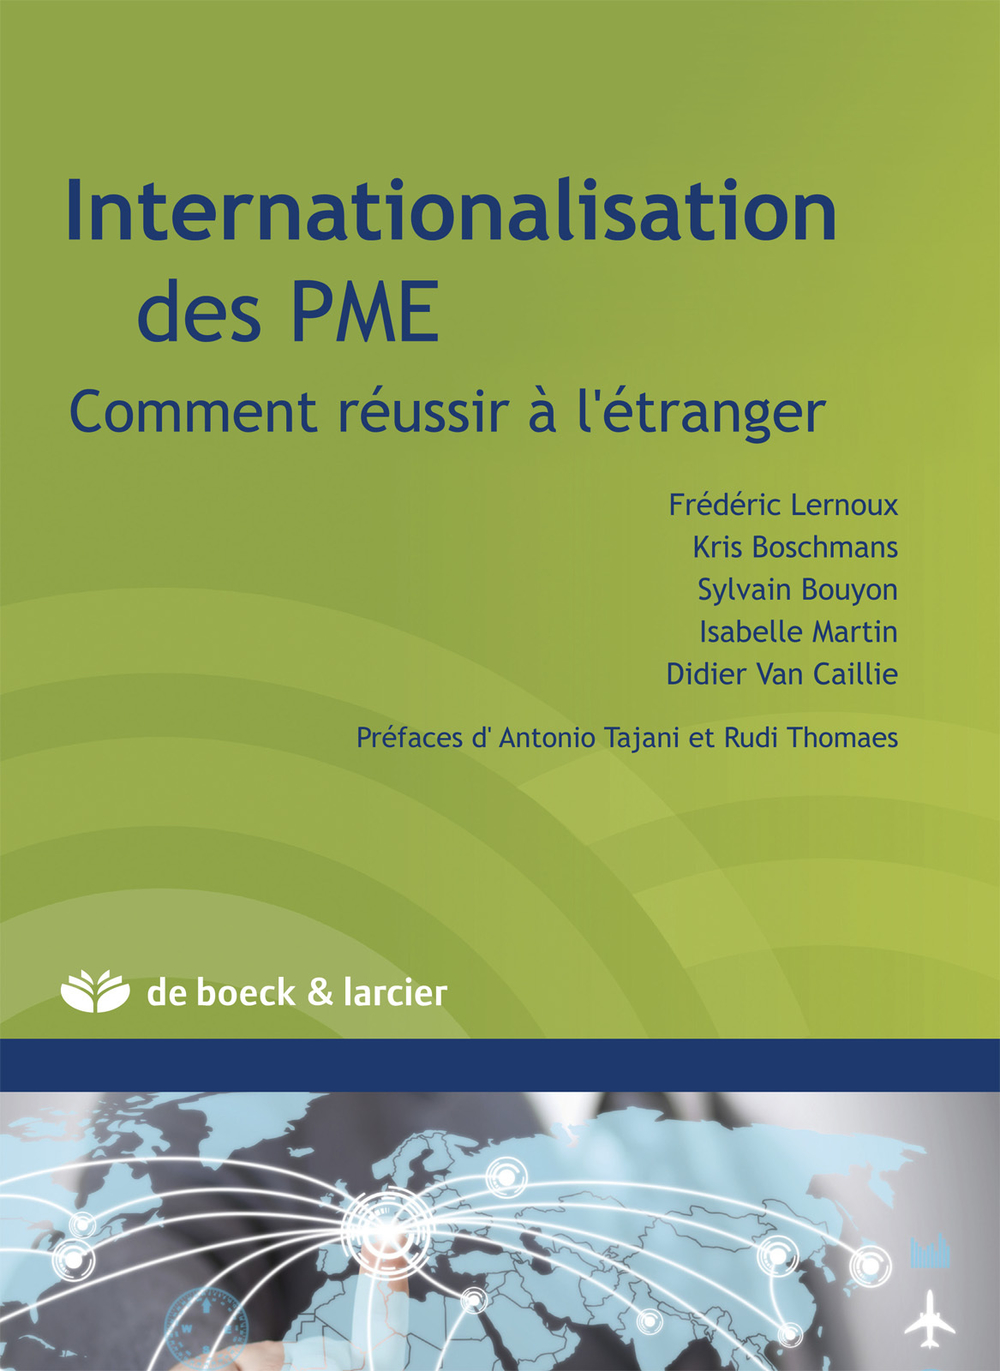 Internationalisation des PME